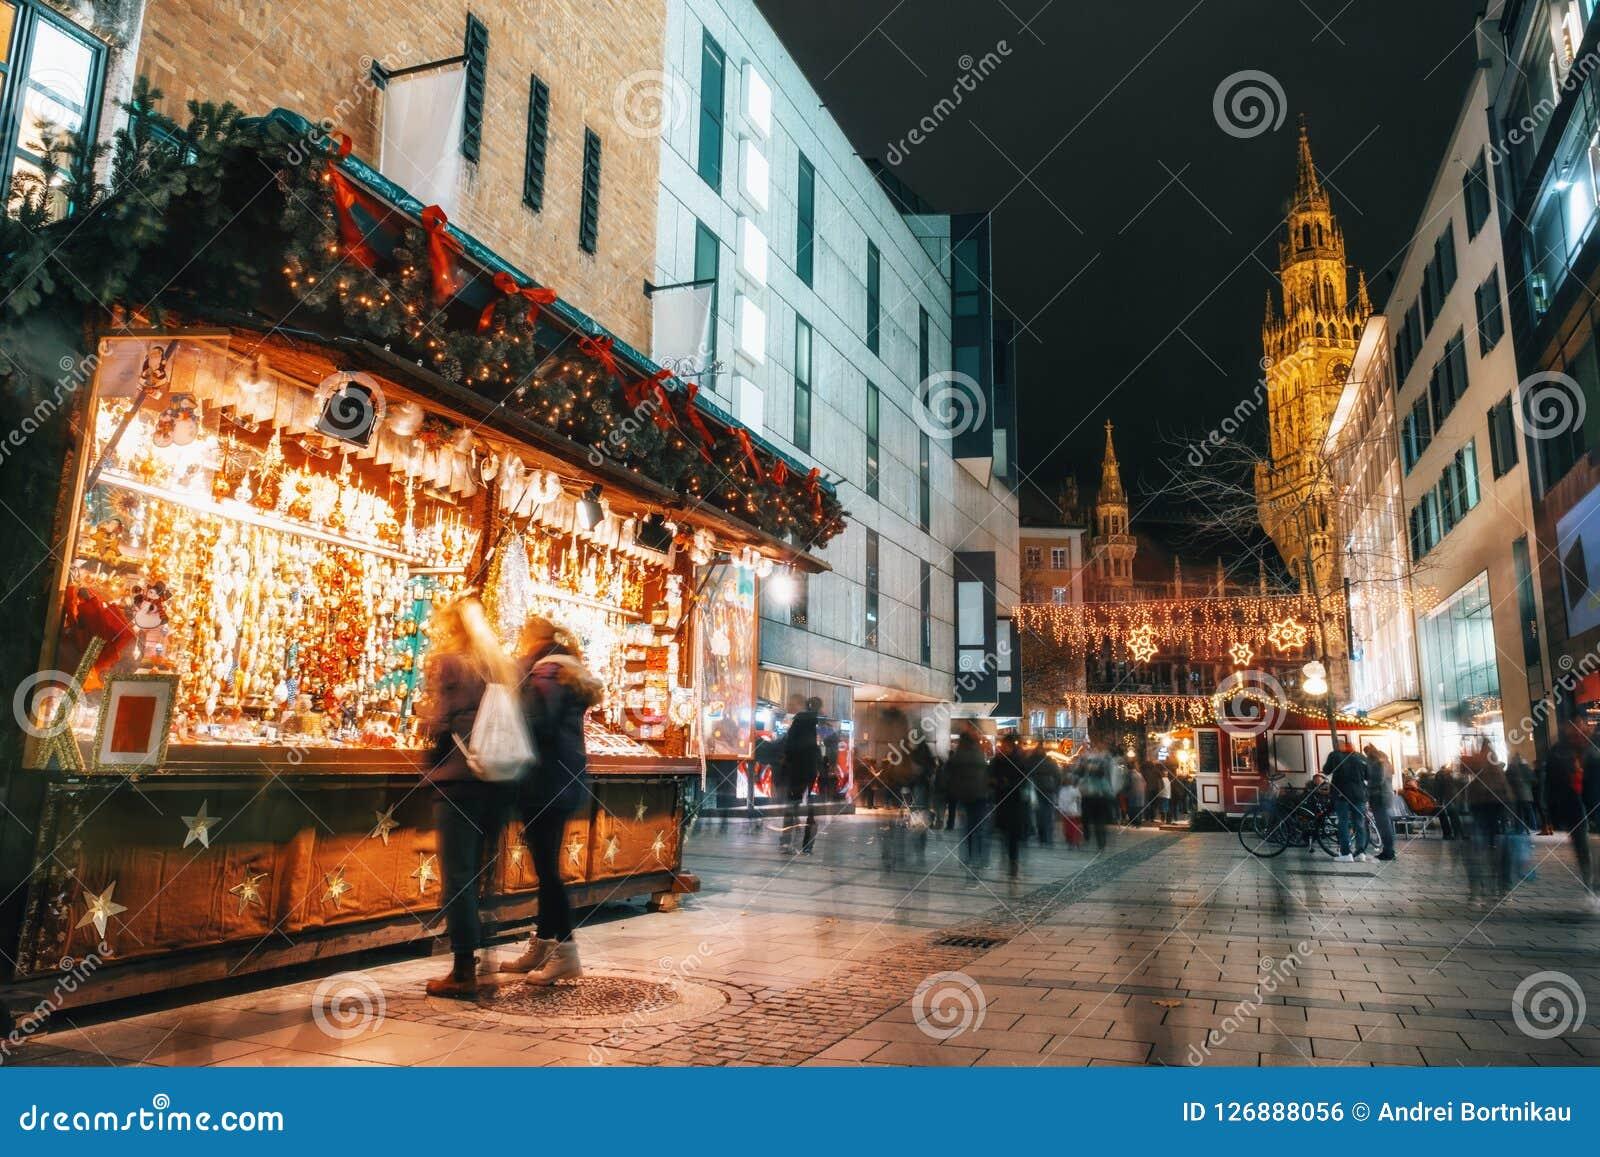 Munich Germany Christmas.Christmas Market On Marienplatz In Munich Germany Stock